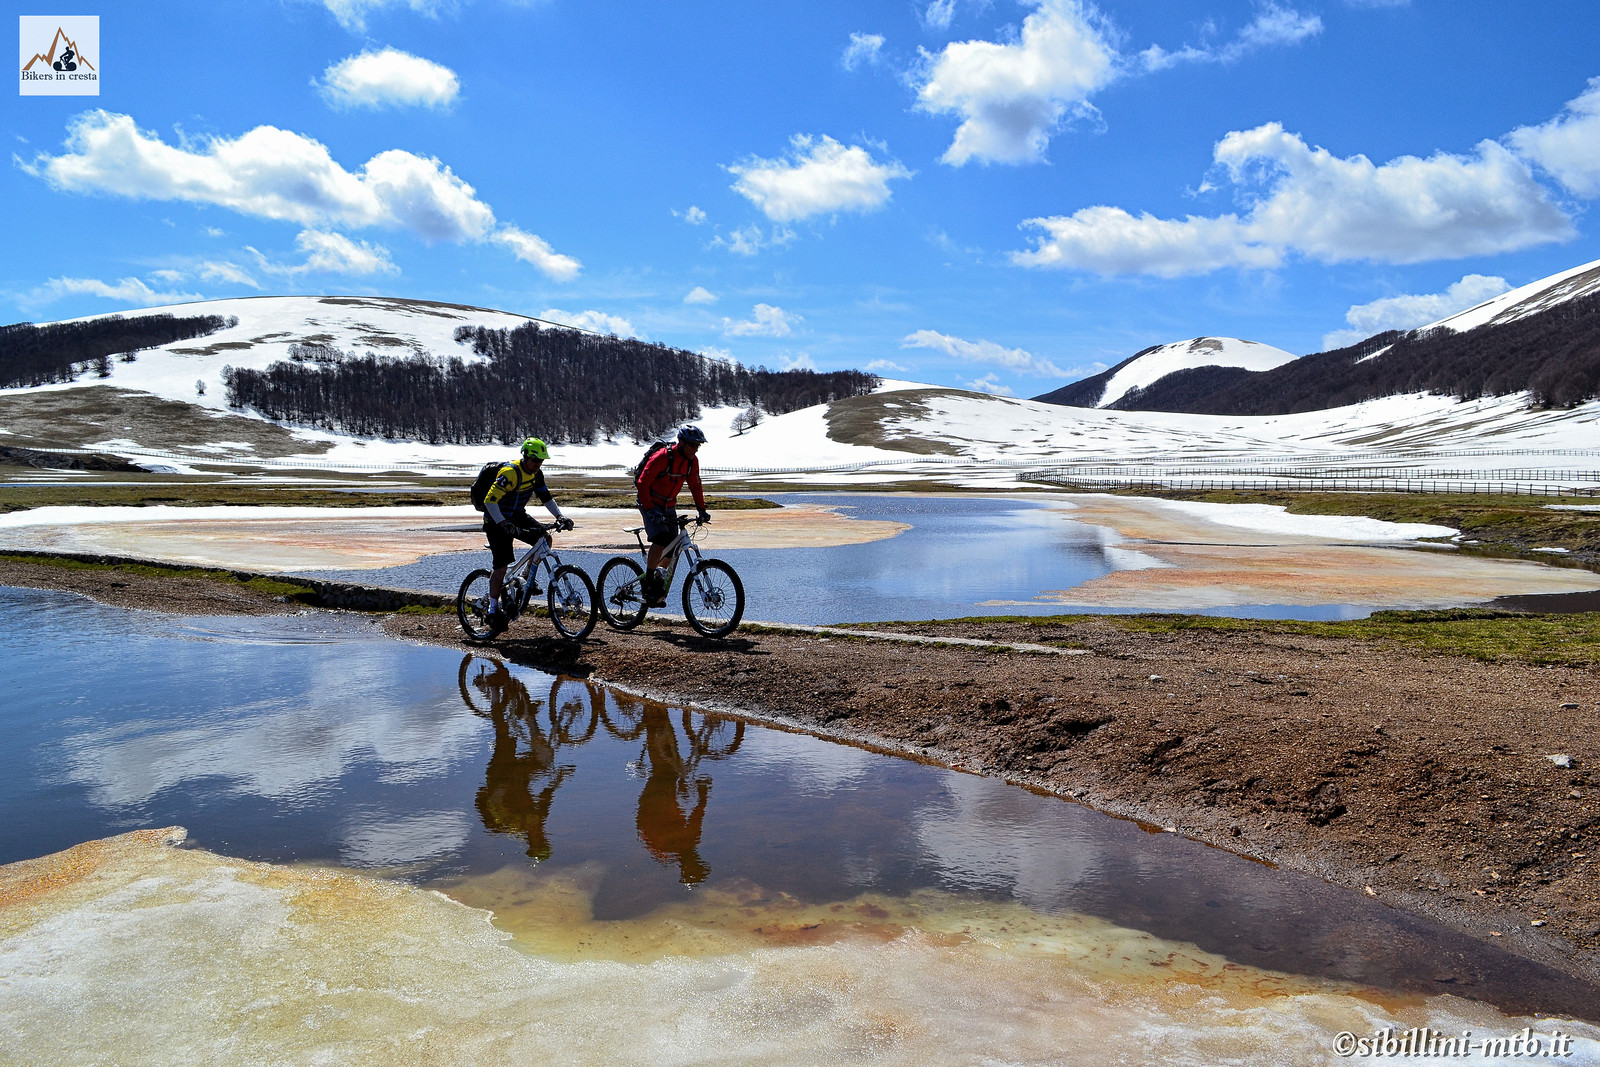 Pantani di Accumoli - barbonis - Mountain Biking Pictures - Vital MTB